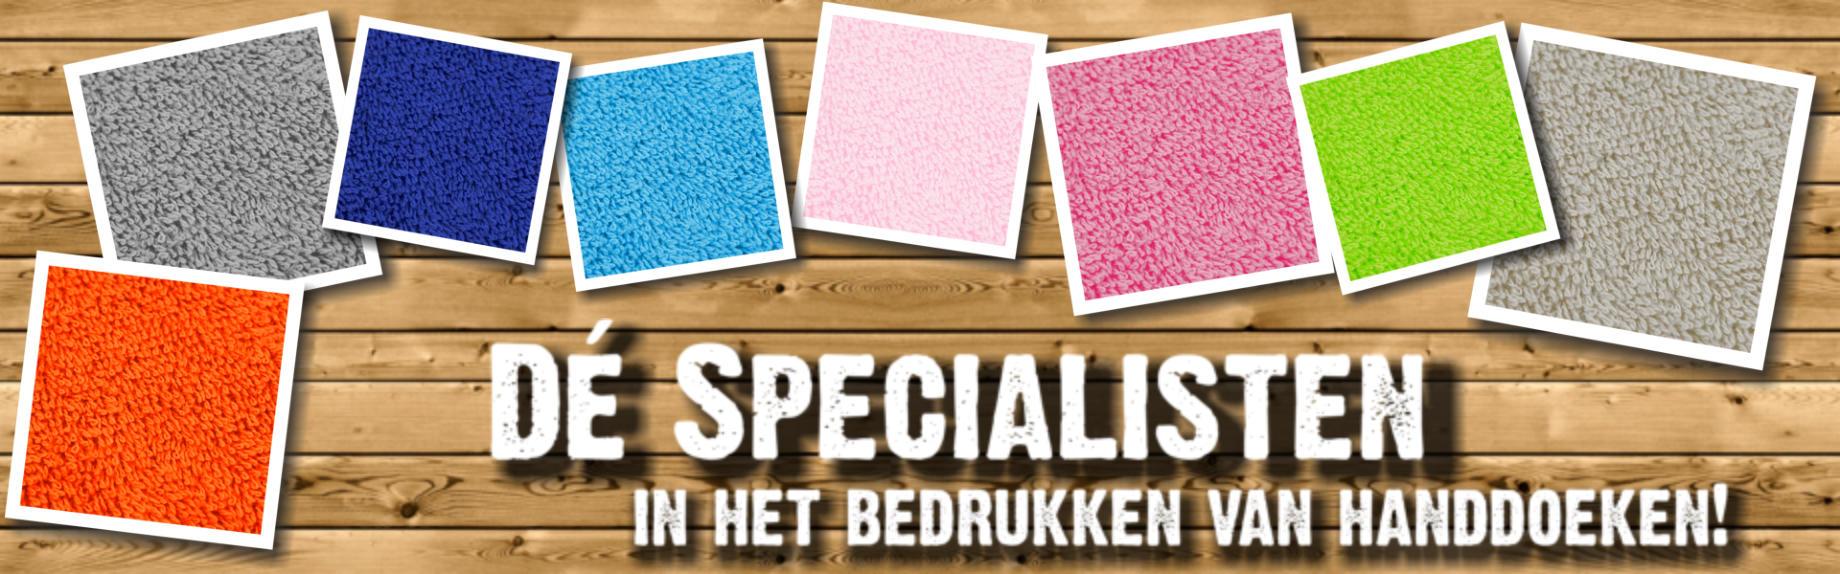 48bce0dbef8 strandlaken-met-logo